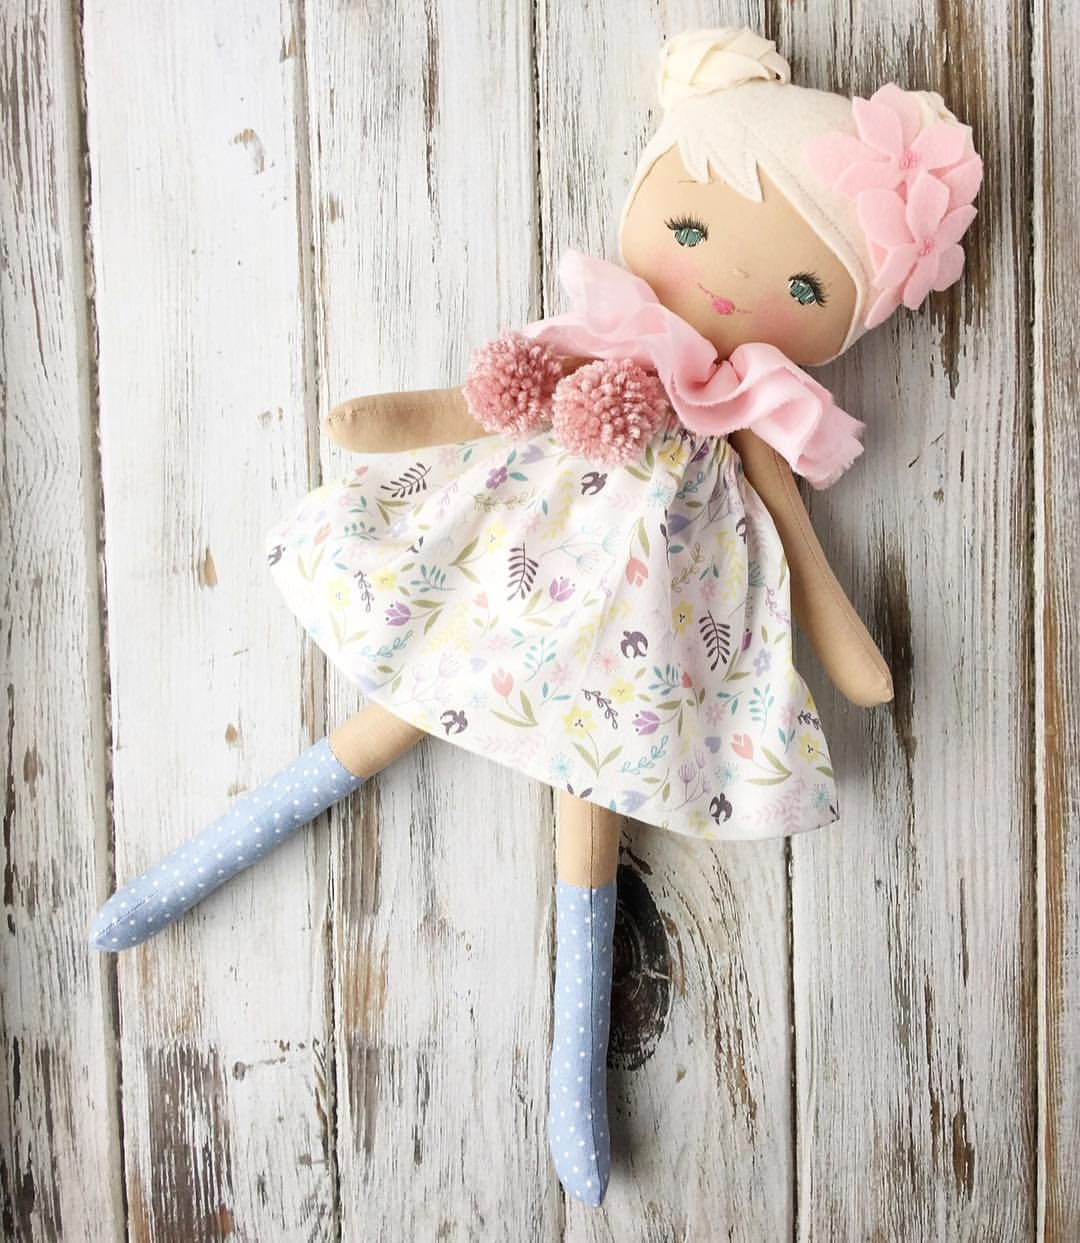 304 Likes, 6 Comments SpunCandy Dolls Omaha, NE